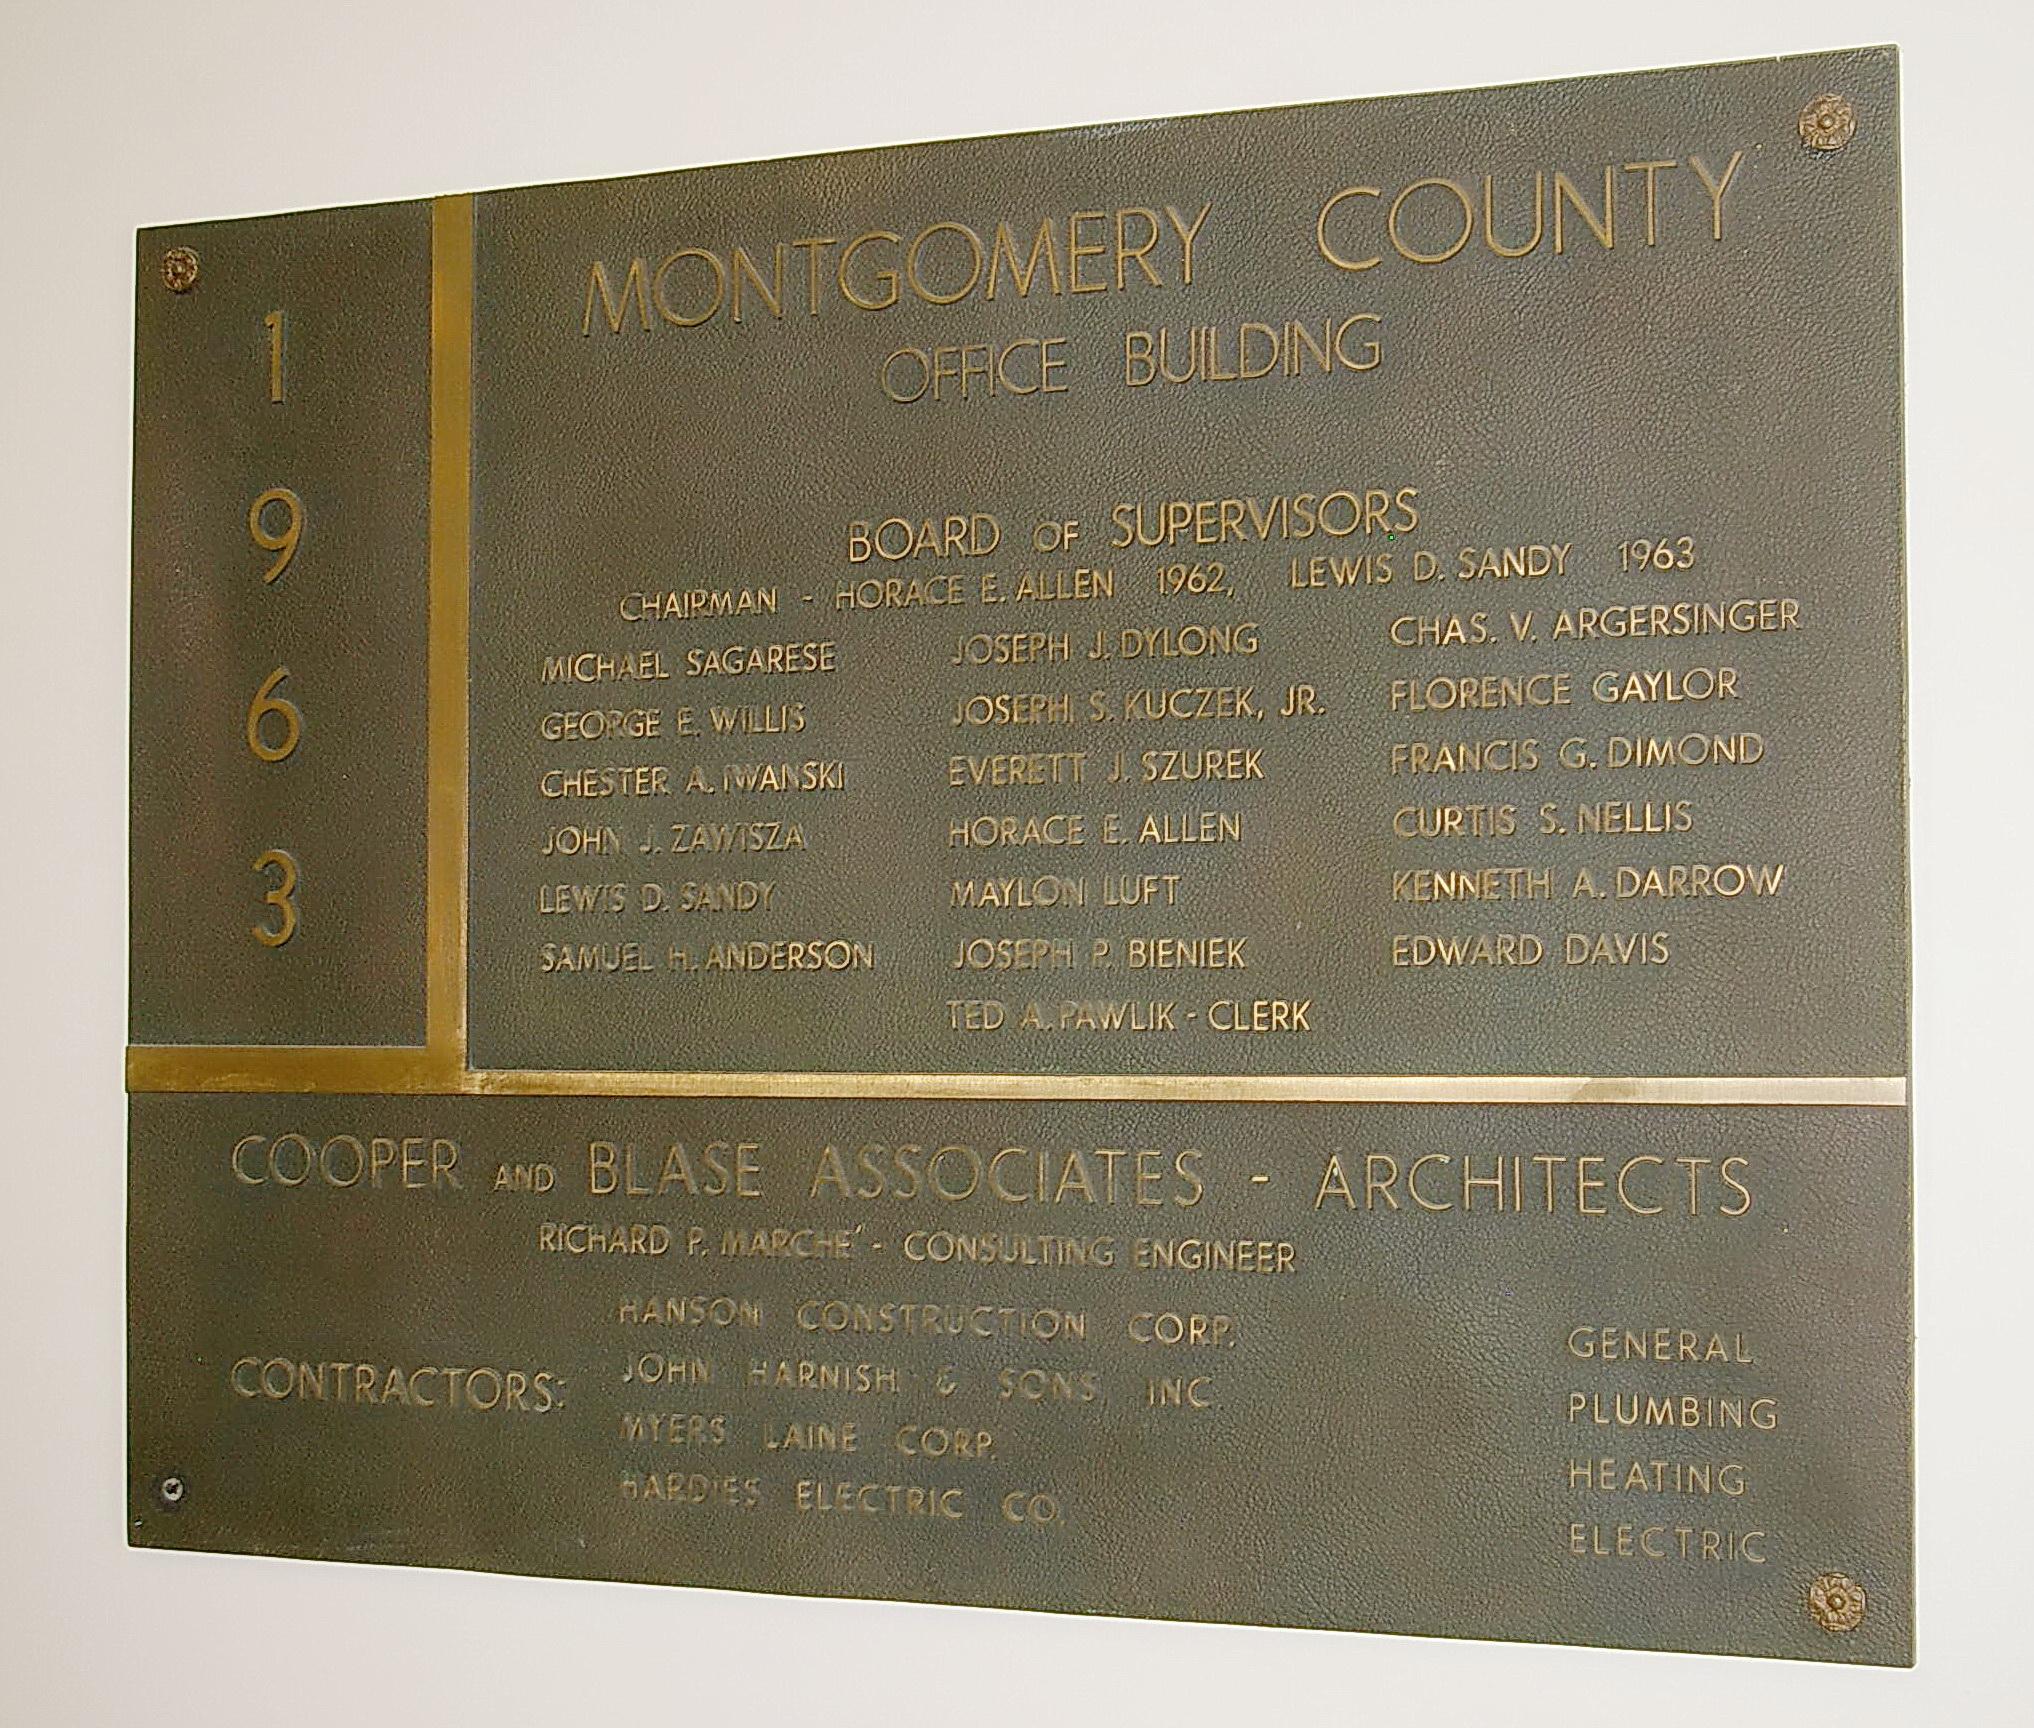 New york montgomery county fonda - 1124k10